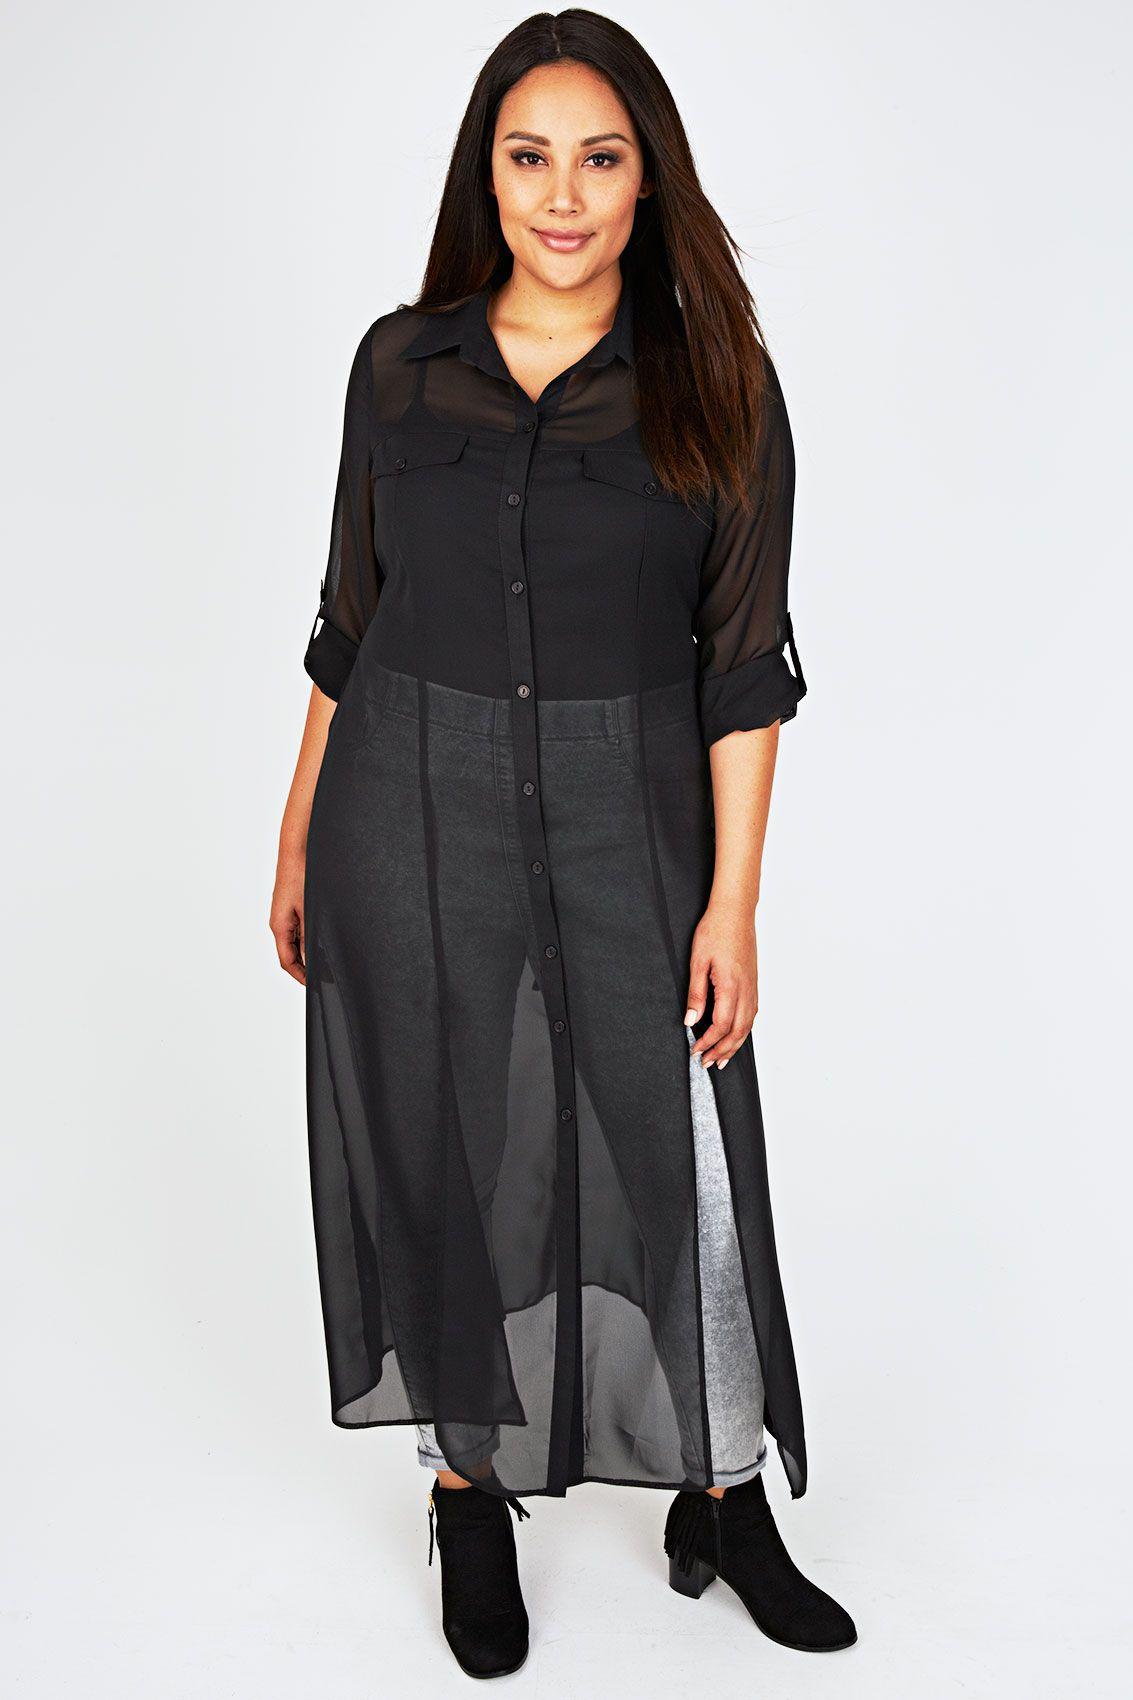 af533e6dd0a8 SCARLETT   JO Black Sheer Maxi Shirt Dress With Front Splits